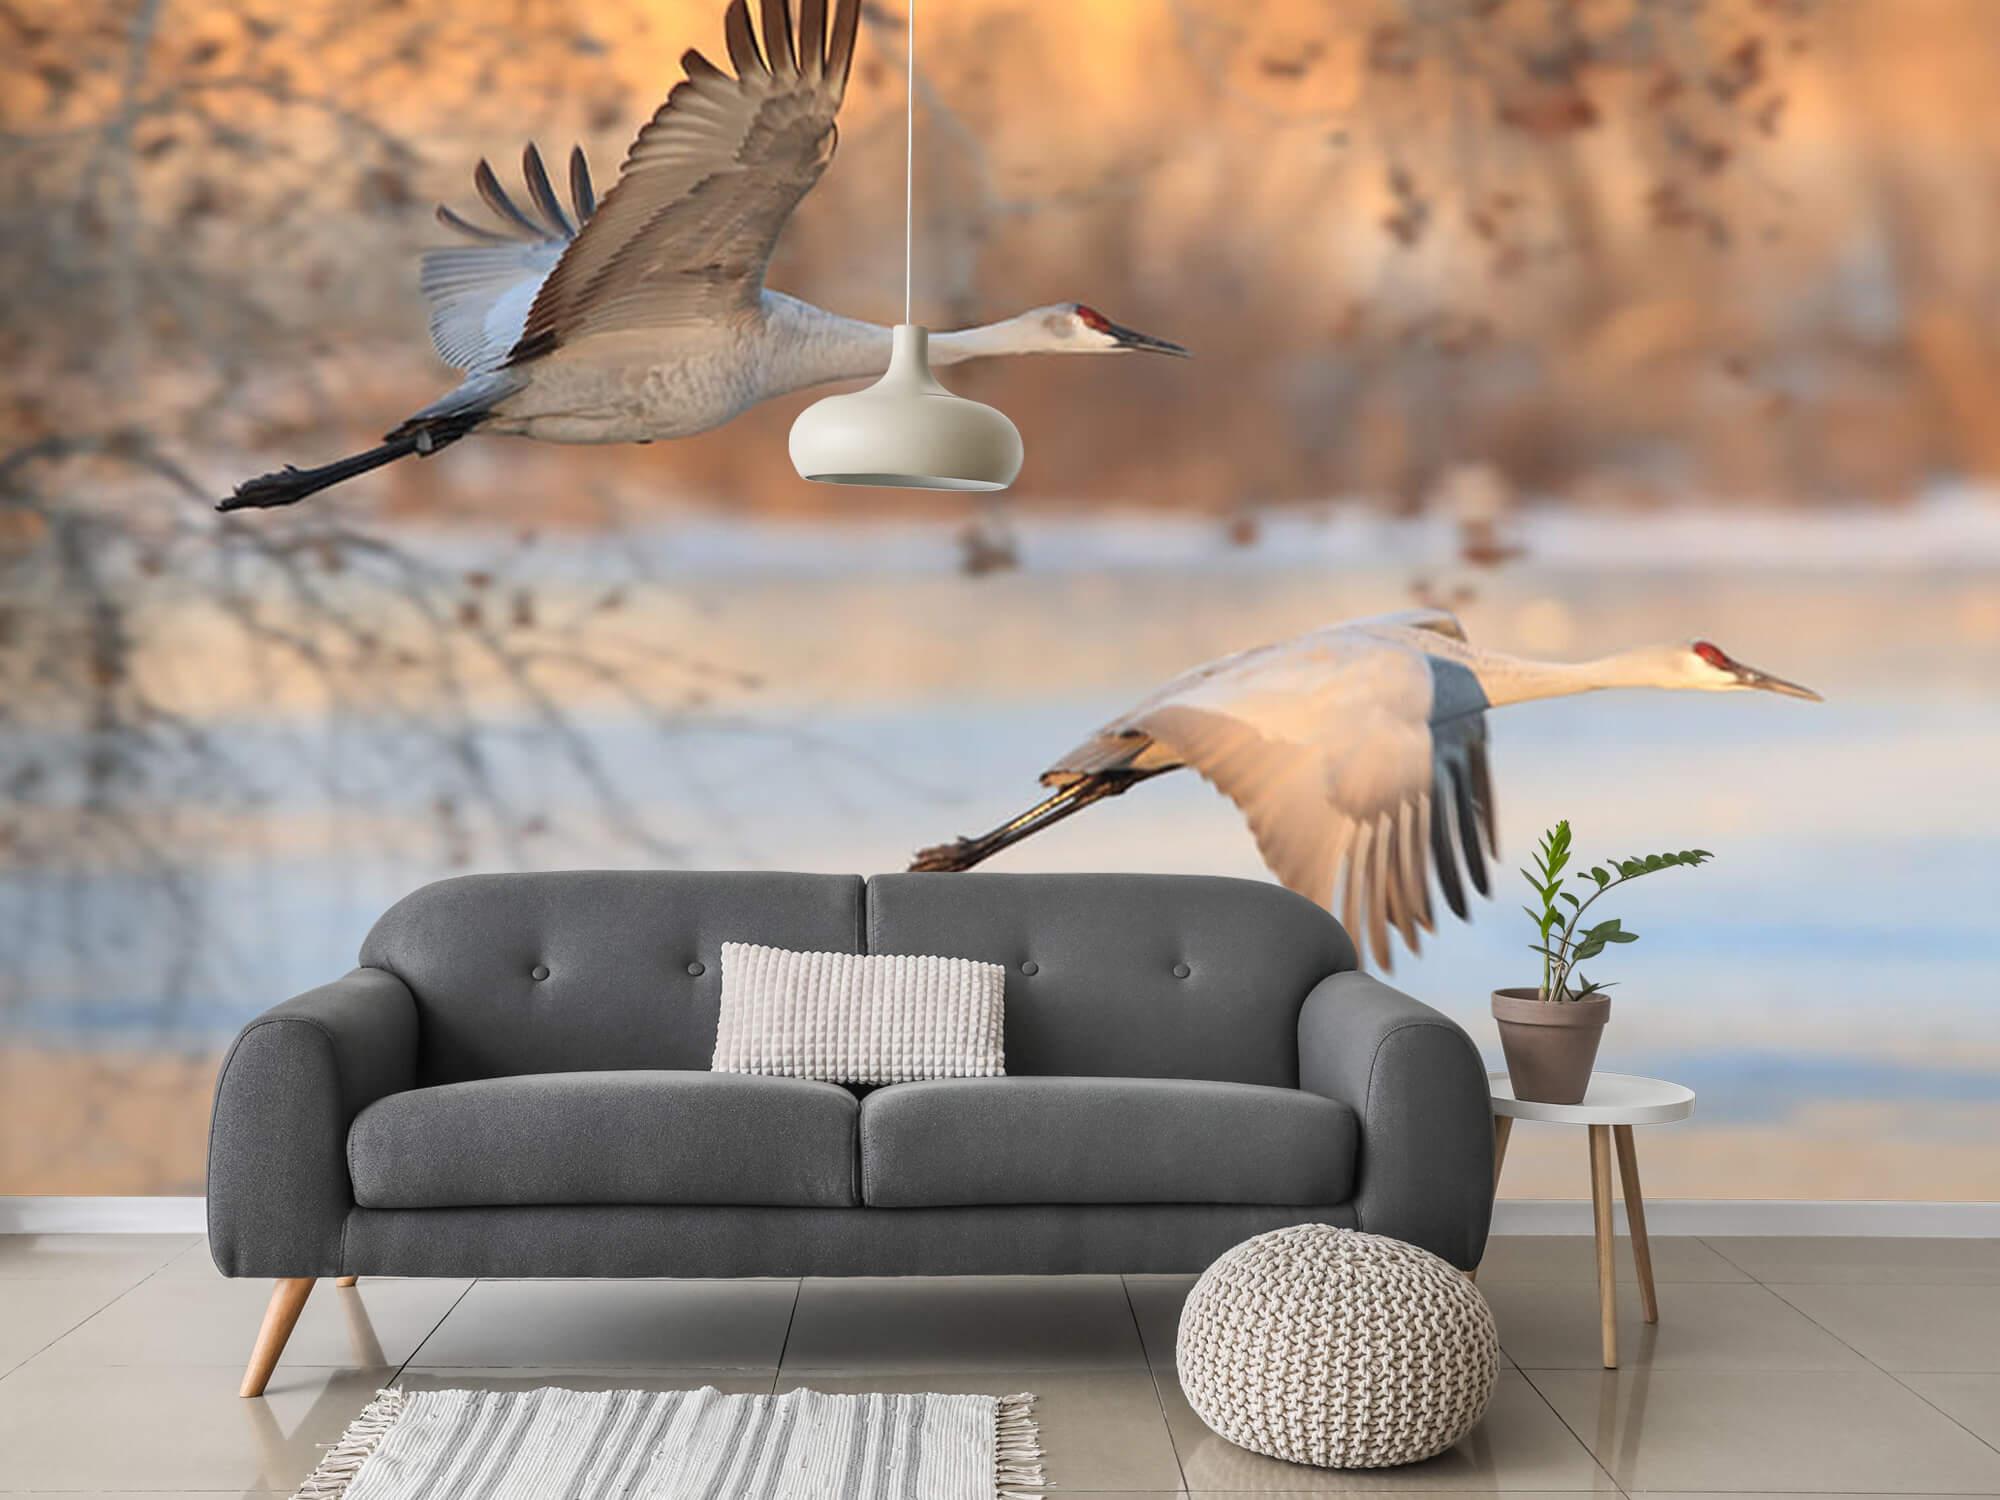 Vliegende kraanvogels 1